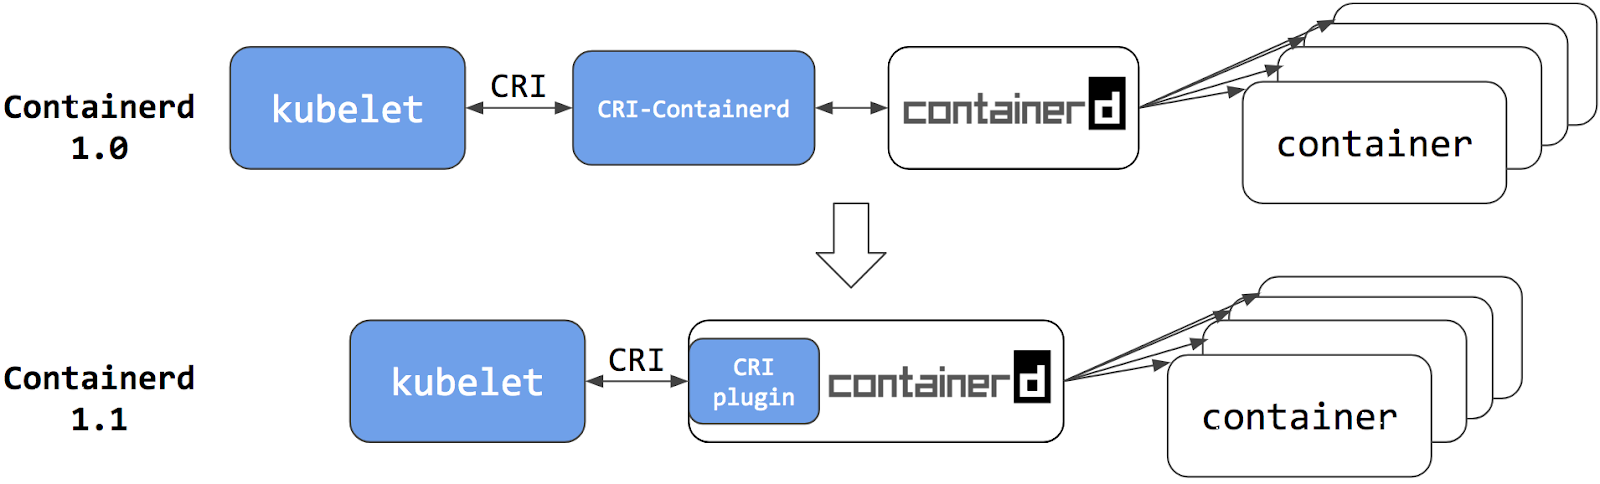 Интеграция containerd с Kubernetes, заменяющая Docker, готова к production - 3